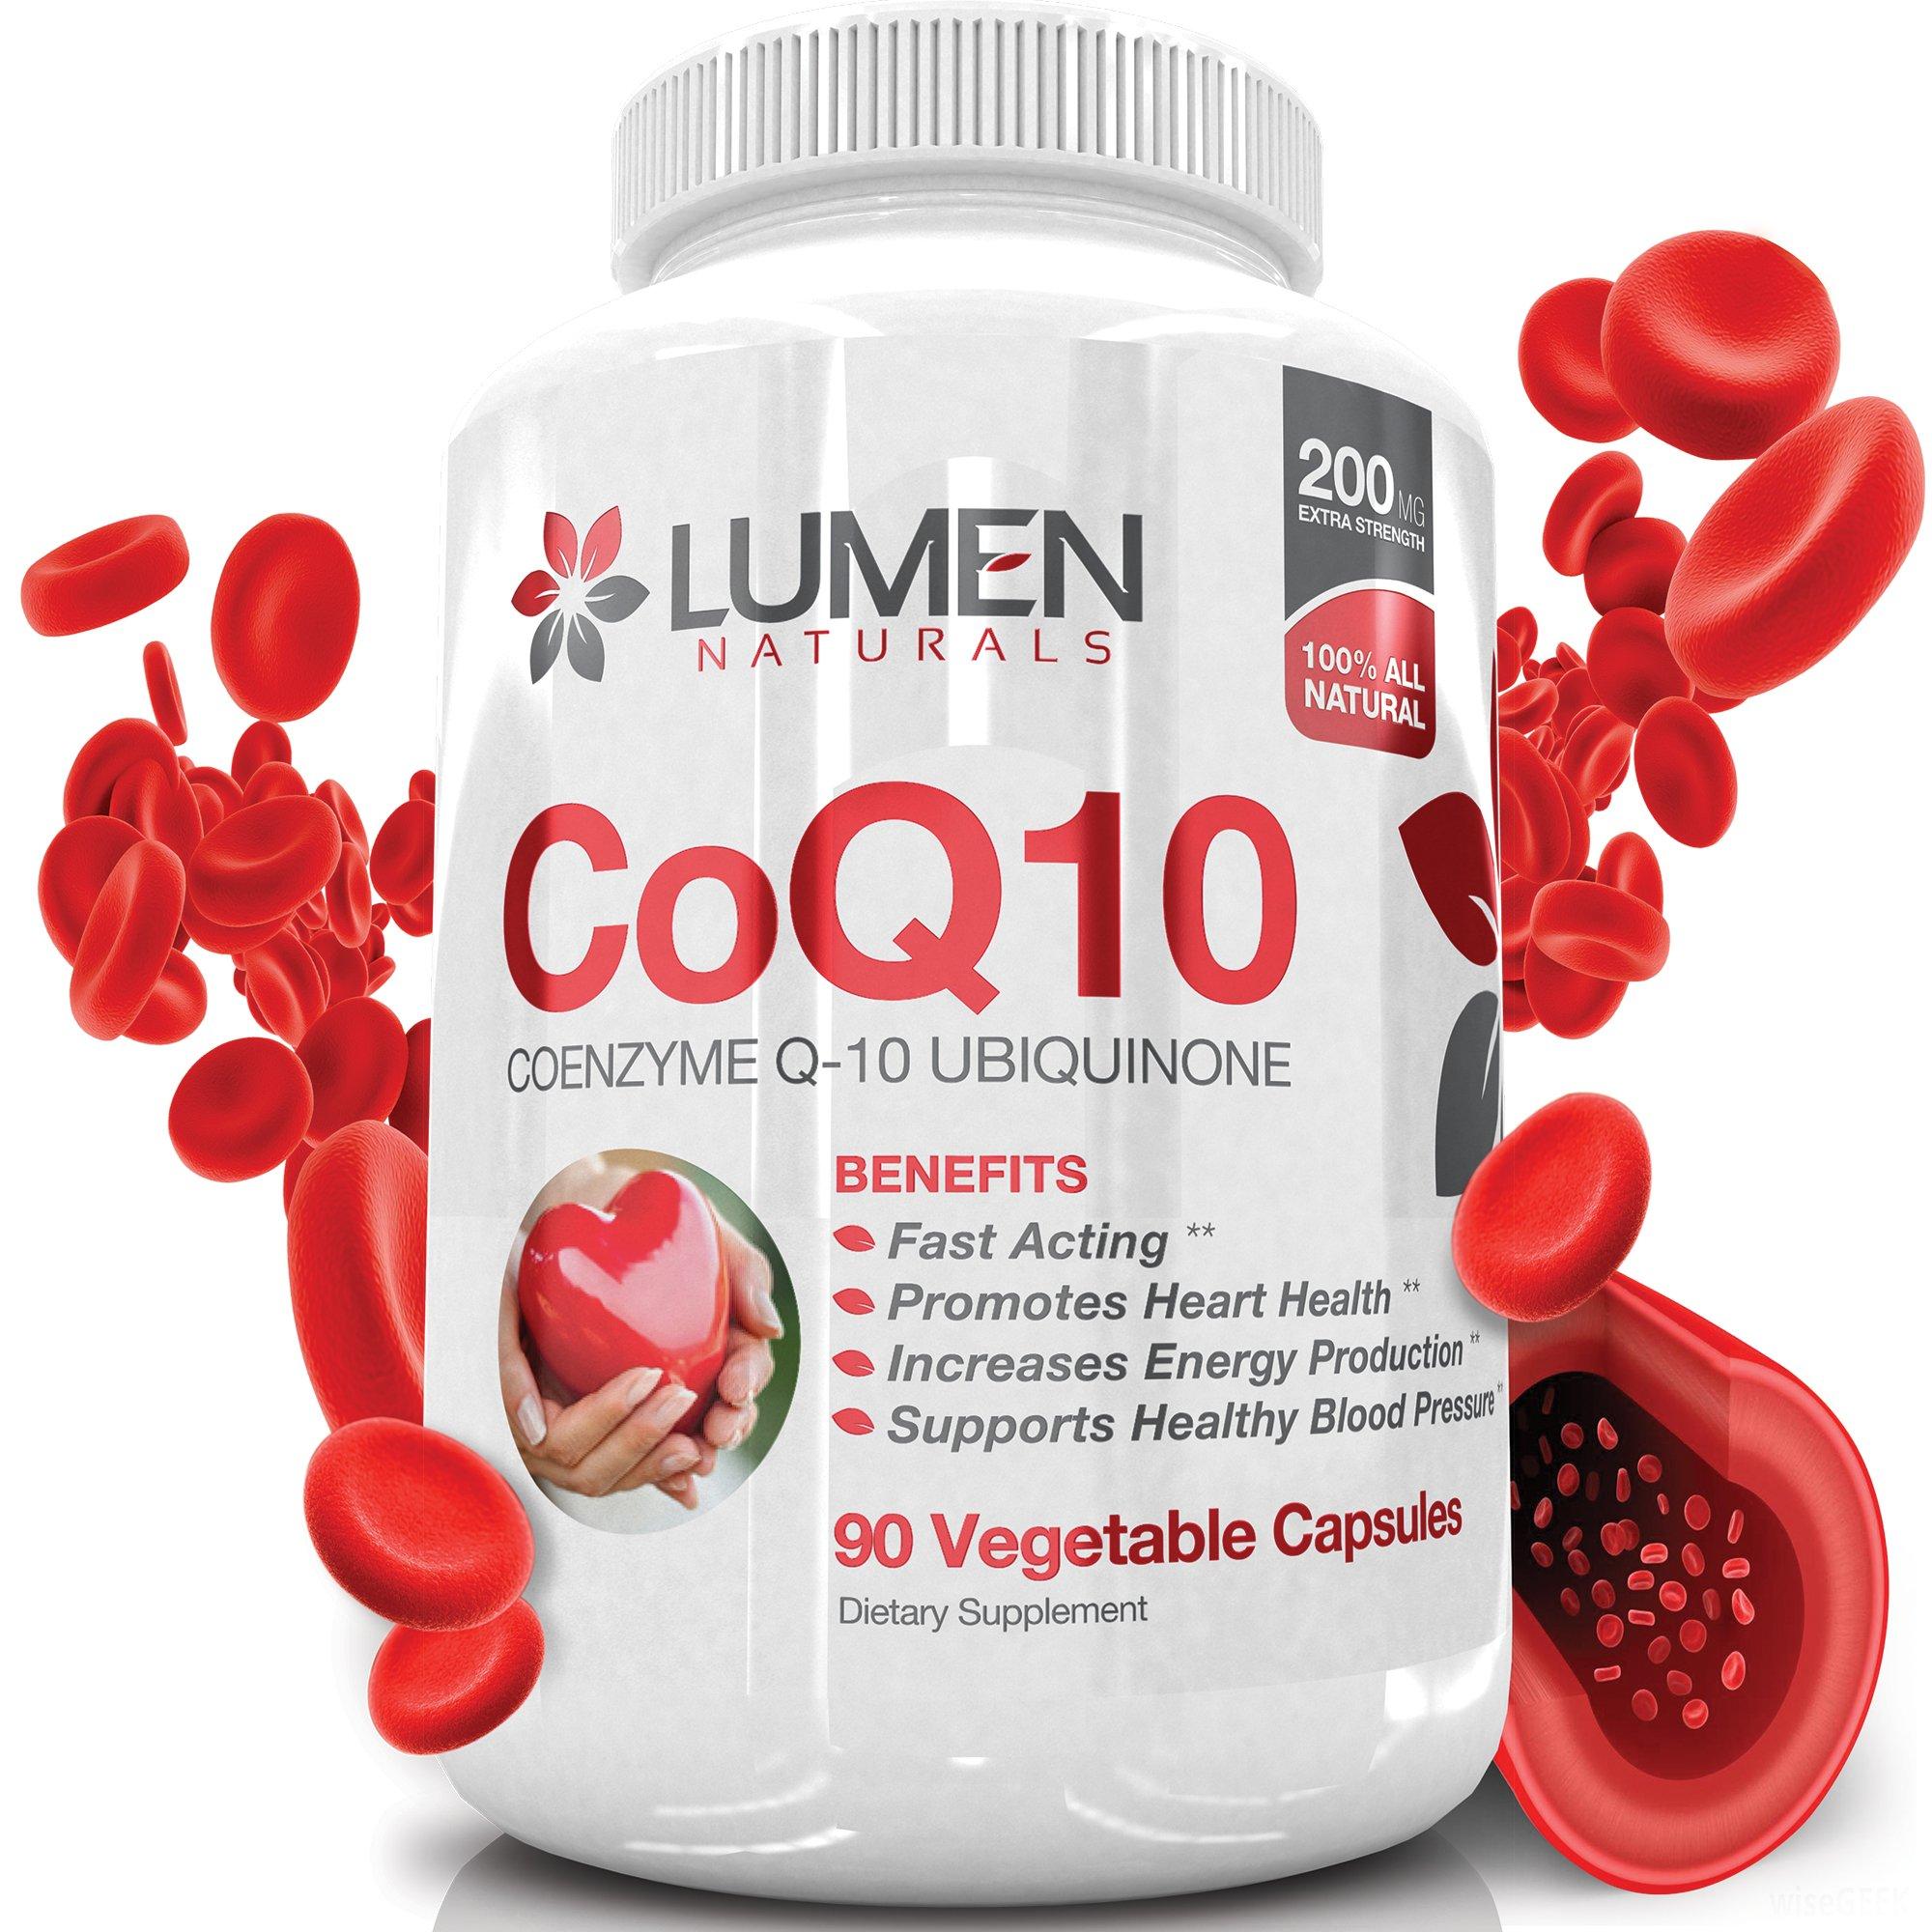 Lumen Naturals Coq10 200Mg - Fast Acting Extra Strength Coenzyme Q10 Ubiquino.. 12